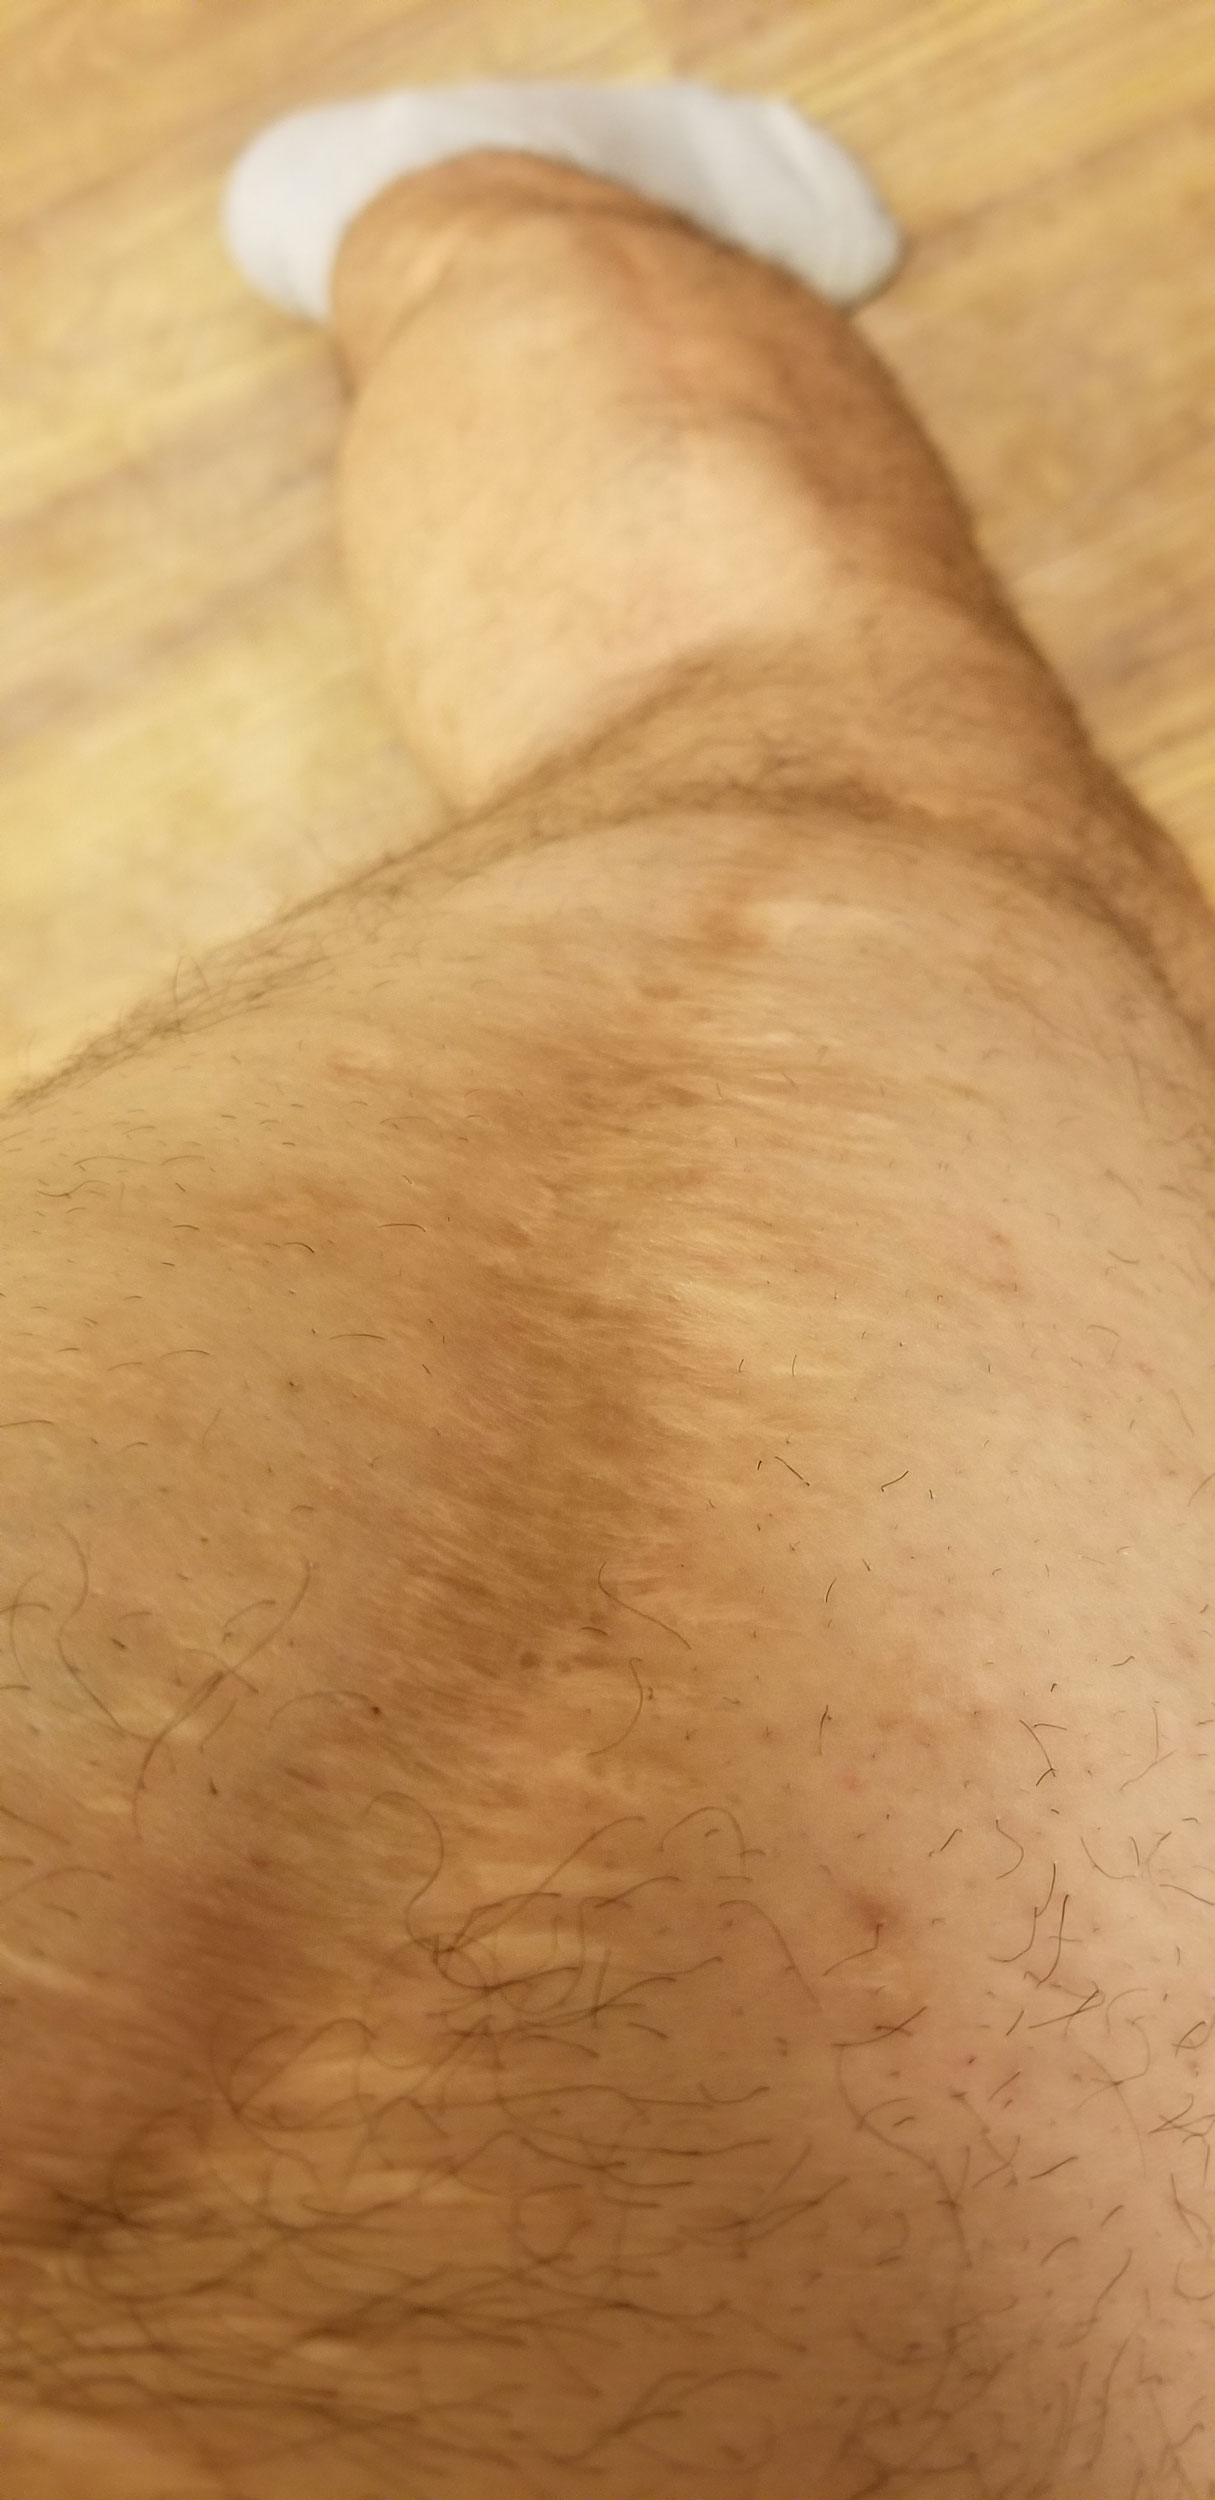 EH-scar.jpg